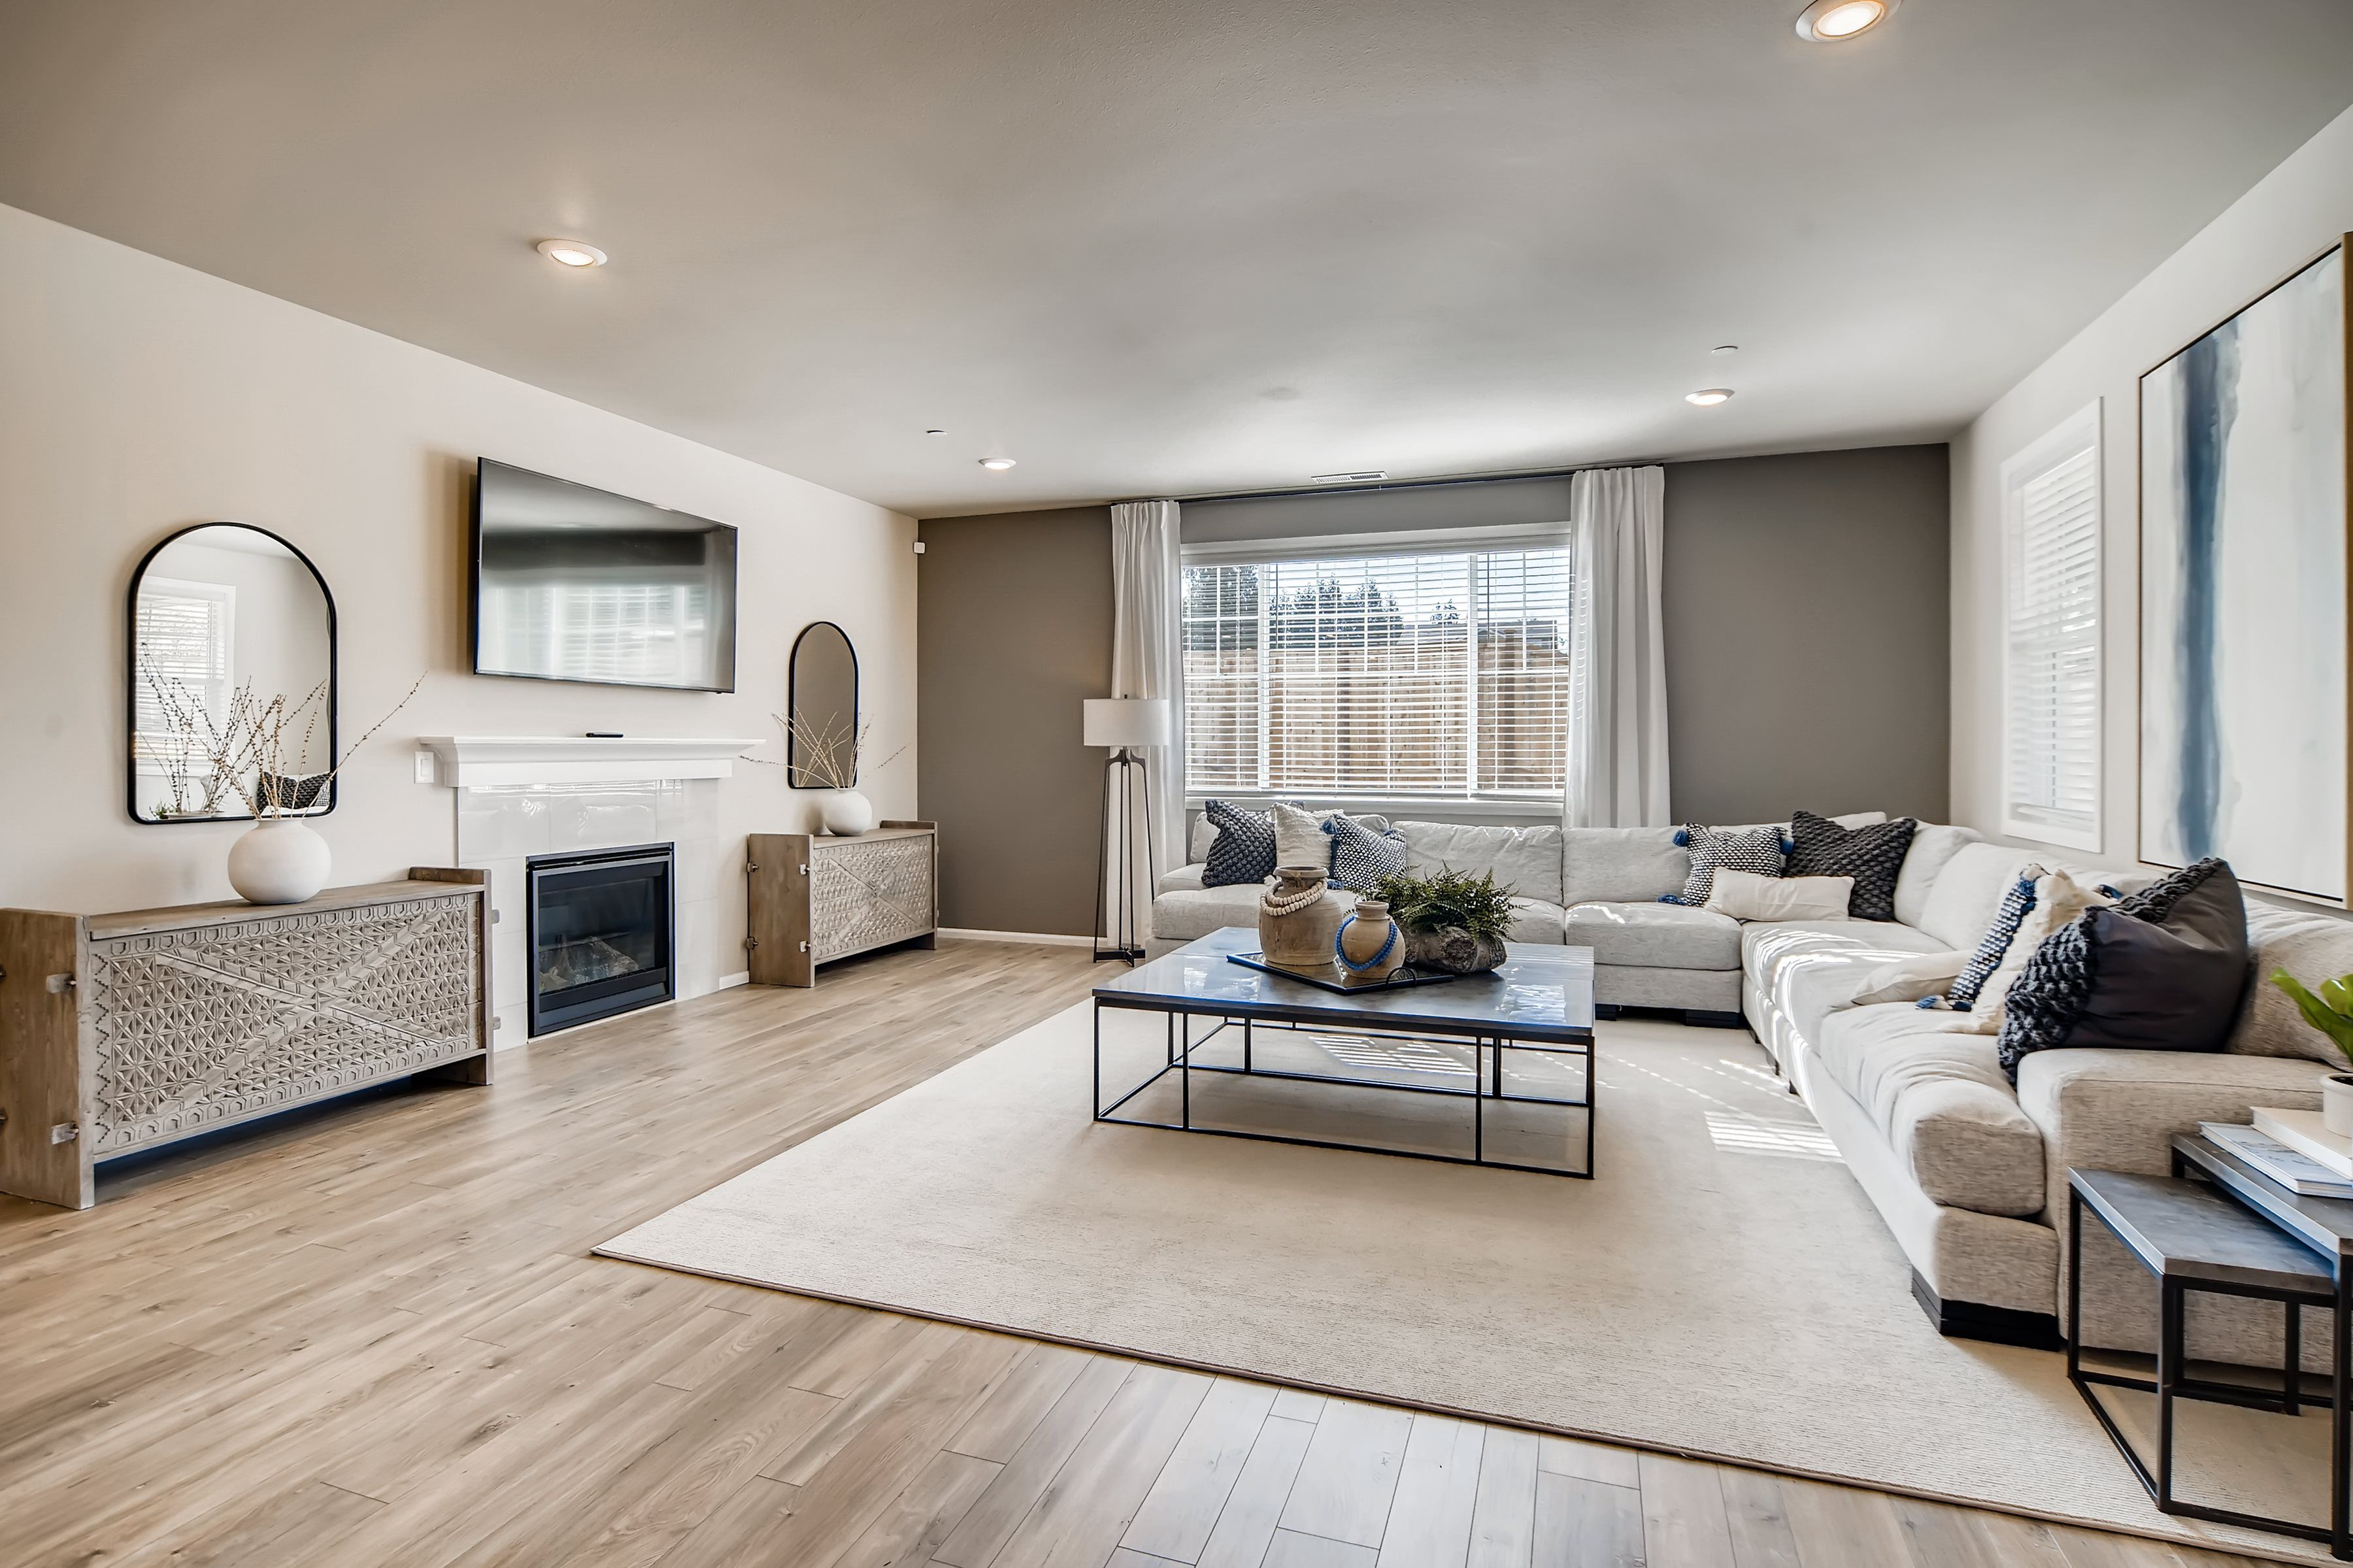 Living Area featured in the Roslyn By Lennar in Seattle-Bellevue, WA